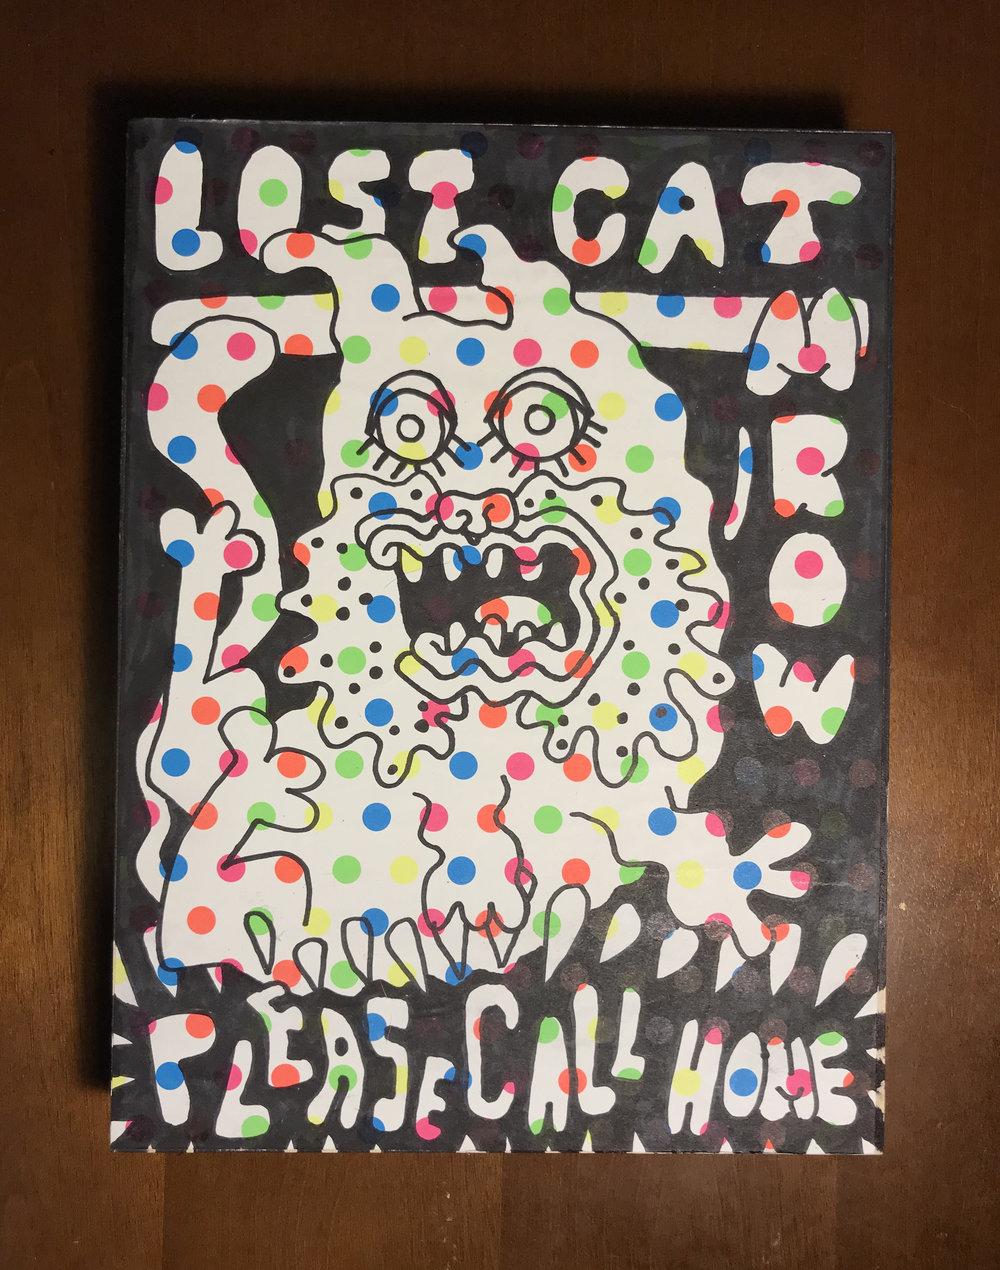 Jarad-Solomon-Lost-Cat-rainbow-7.jpg